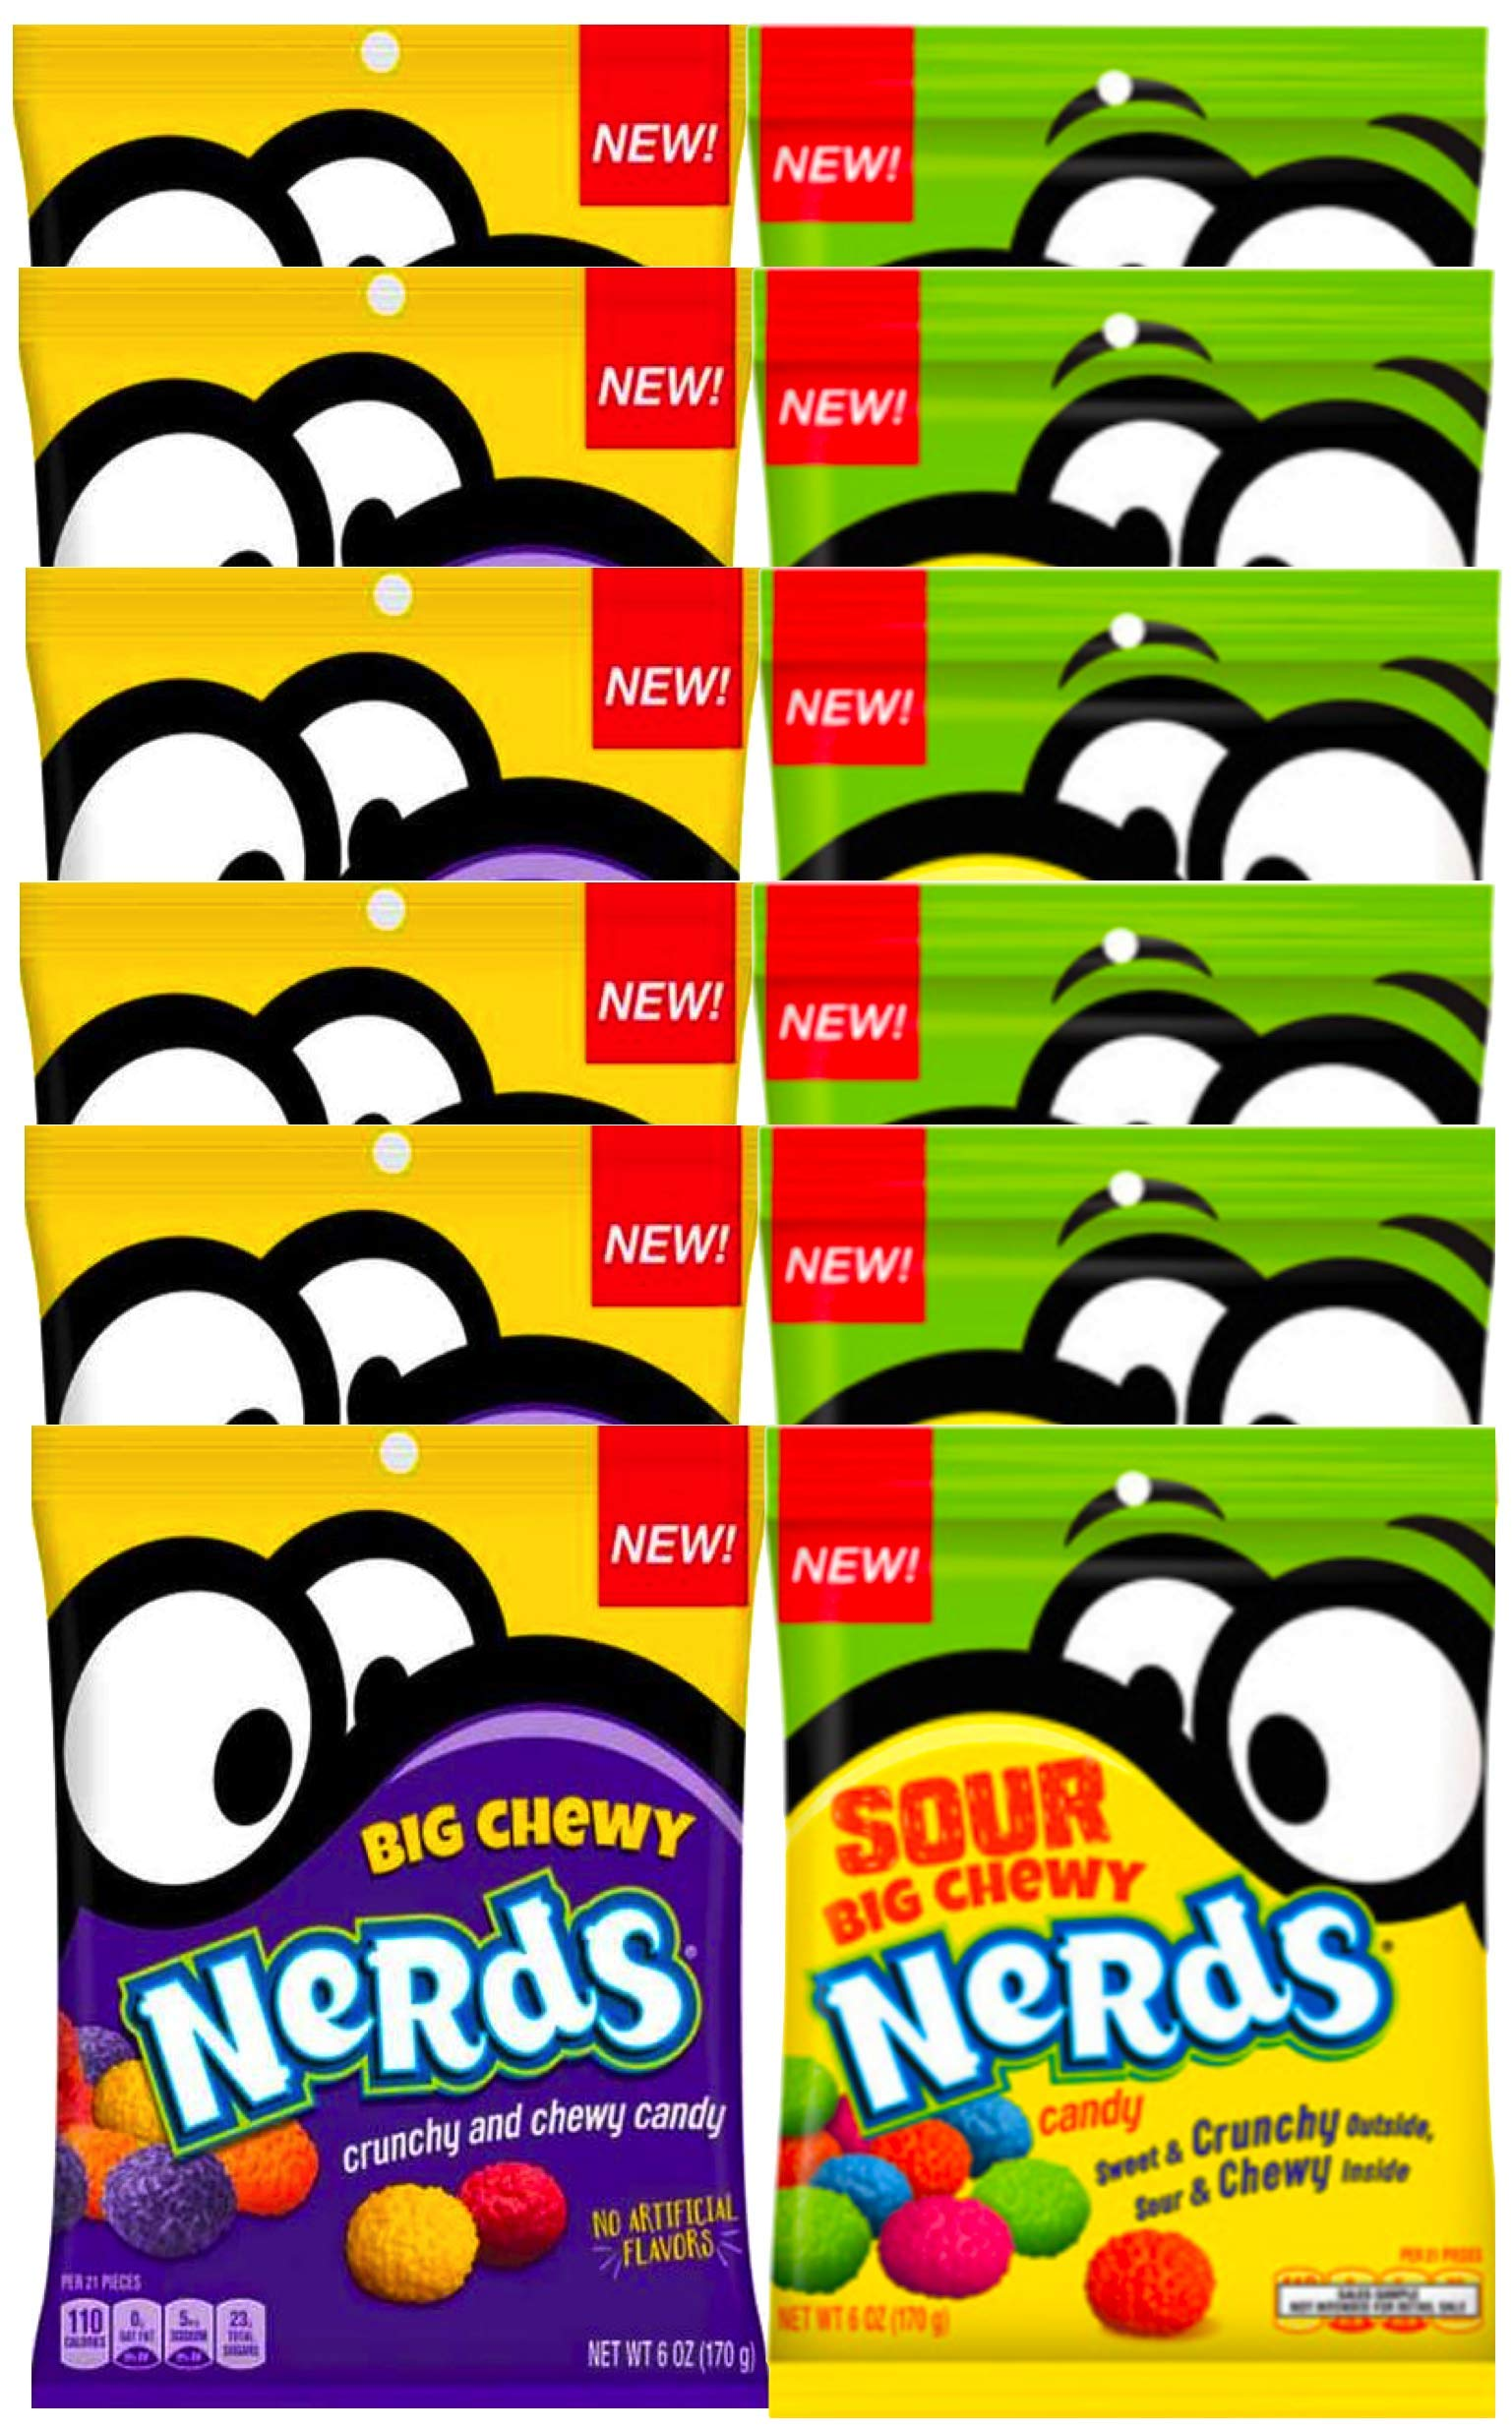 NEW Nerds Big Chewy Nerds Sour & Crunchy No Artificial Flavors Net WT 6oz (12)